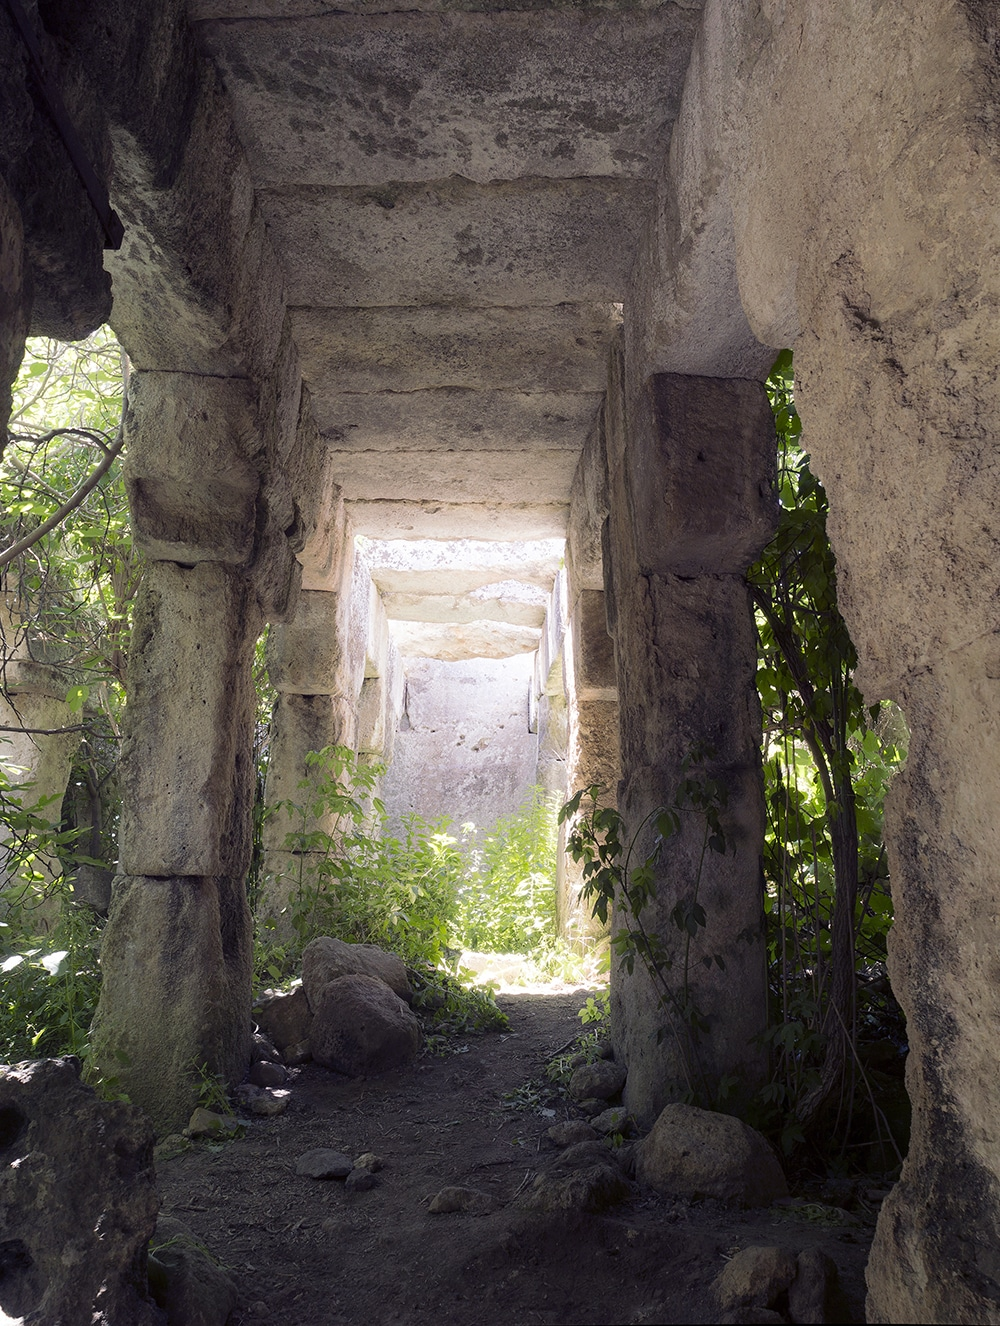 san basilio tempio lentini inside chamber